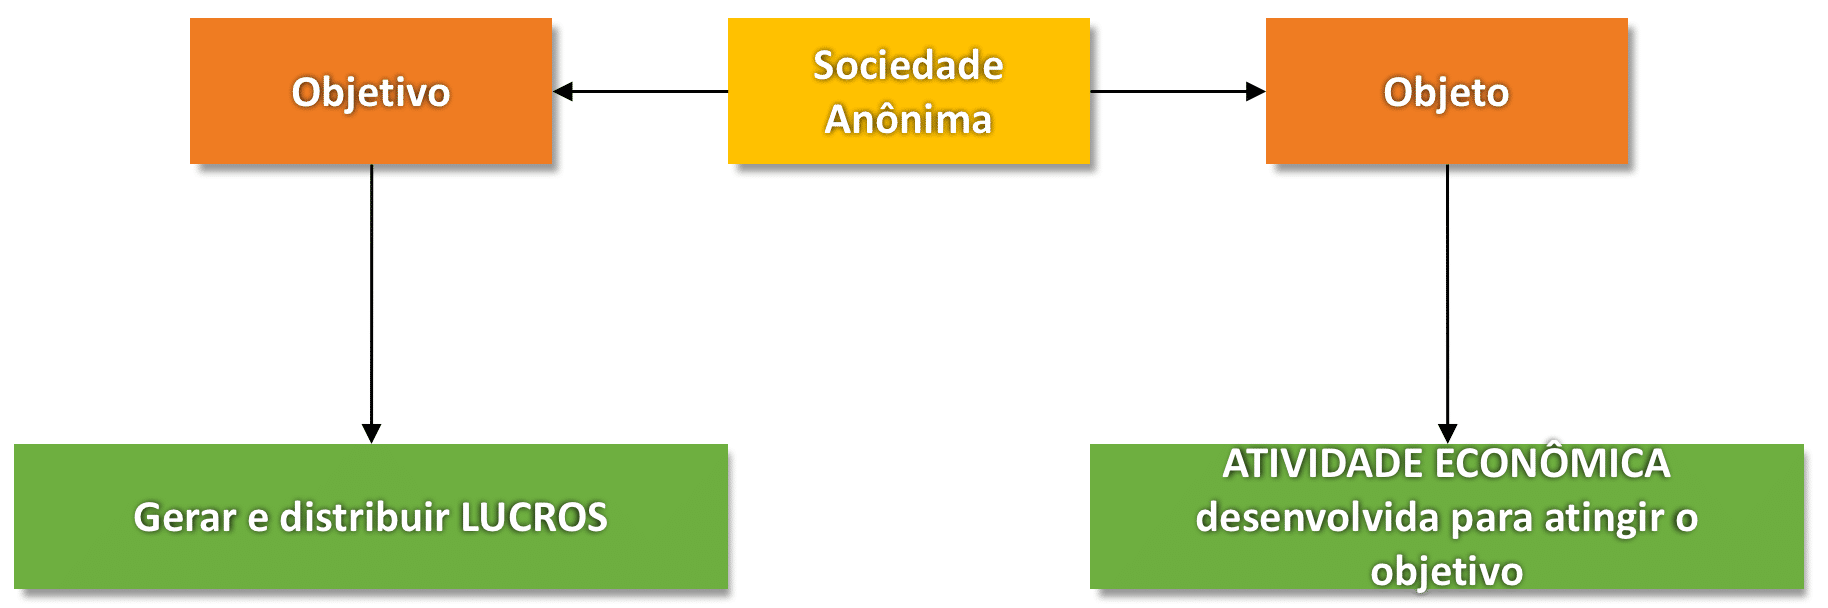 Objetivo e Objeto Social